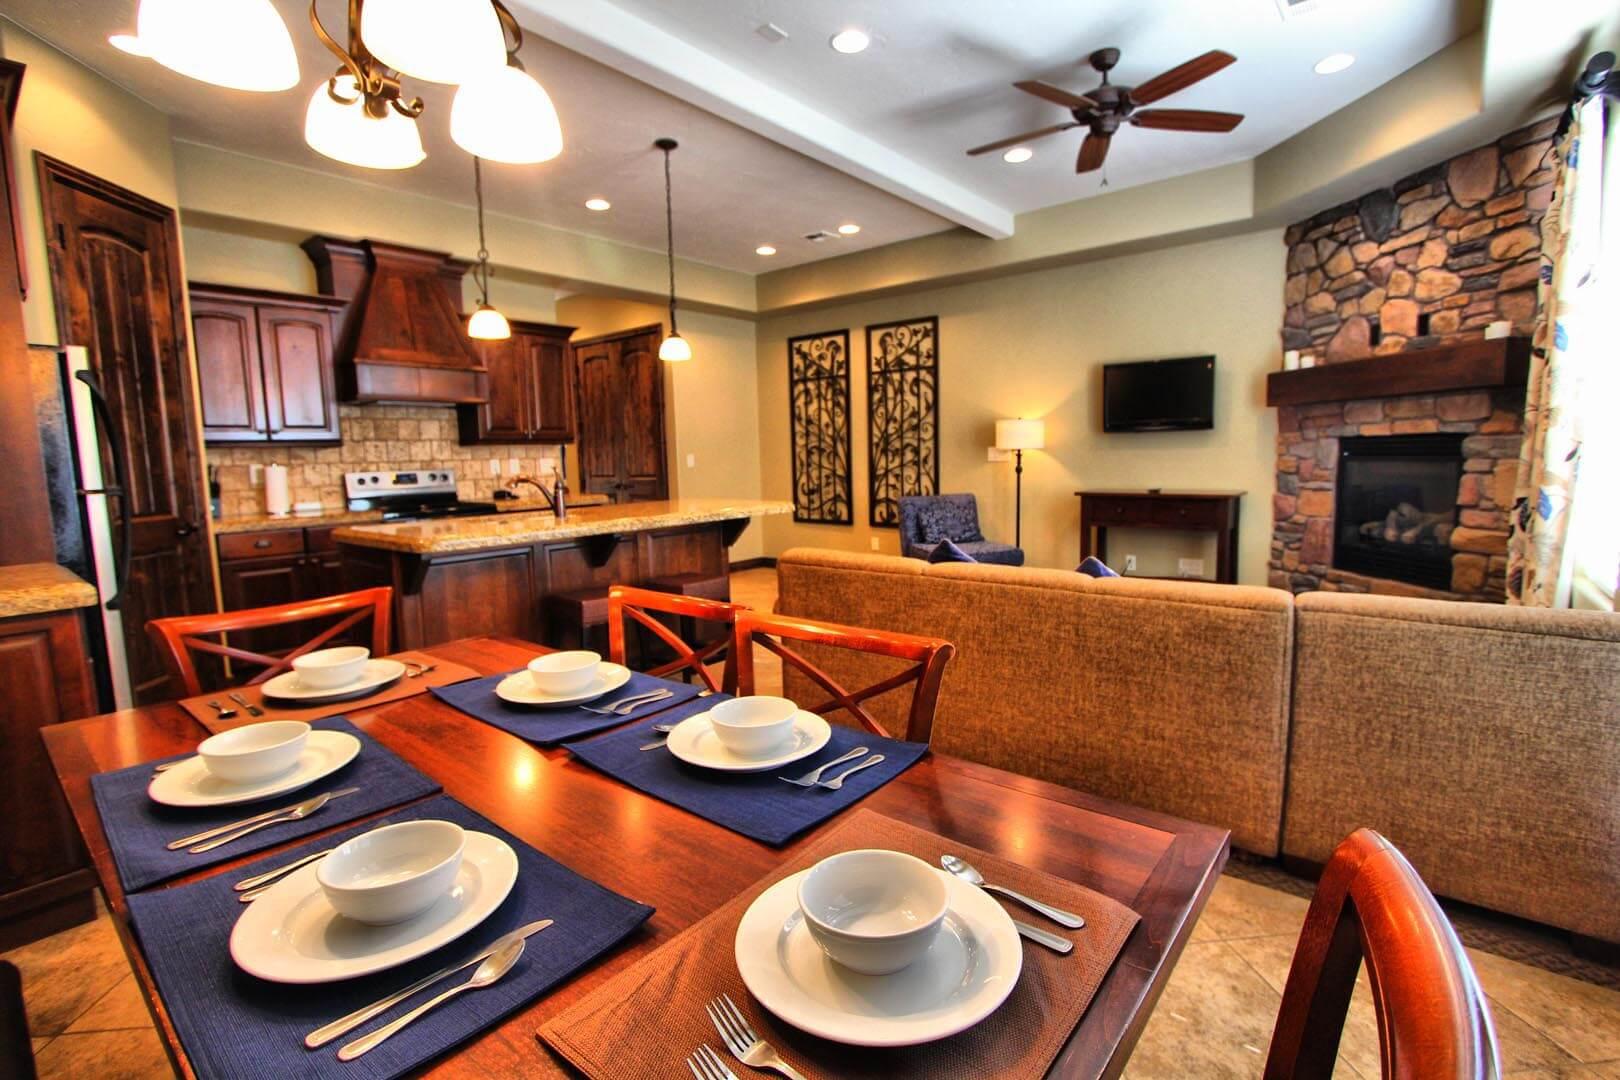 Canyon Villas Dining Room